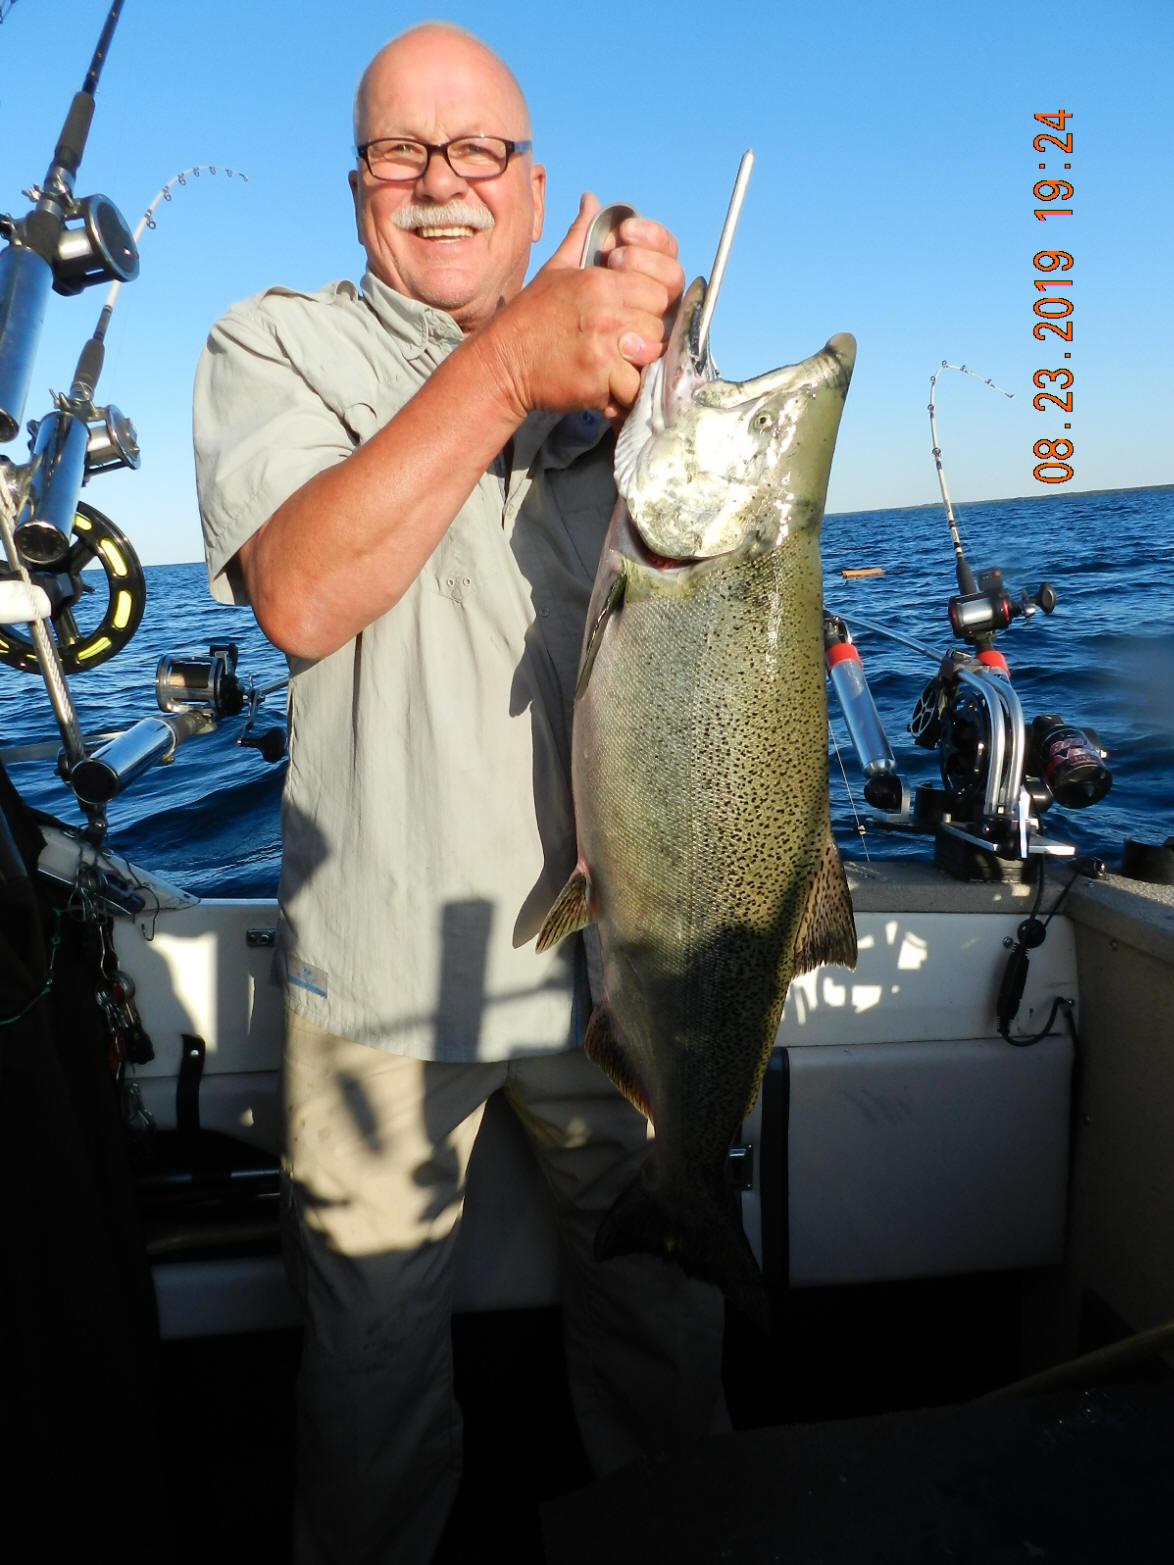 Manistee, Lake Michigan Salmon tackle and Salmon Buster